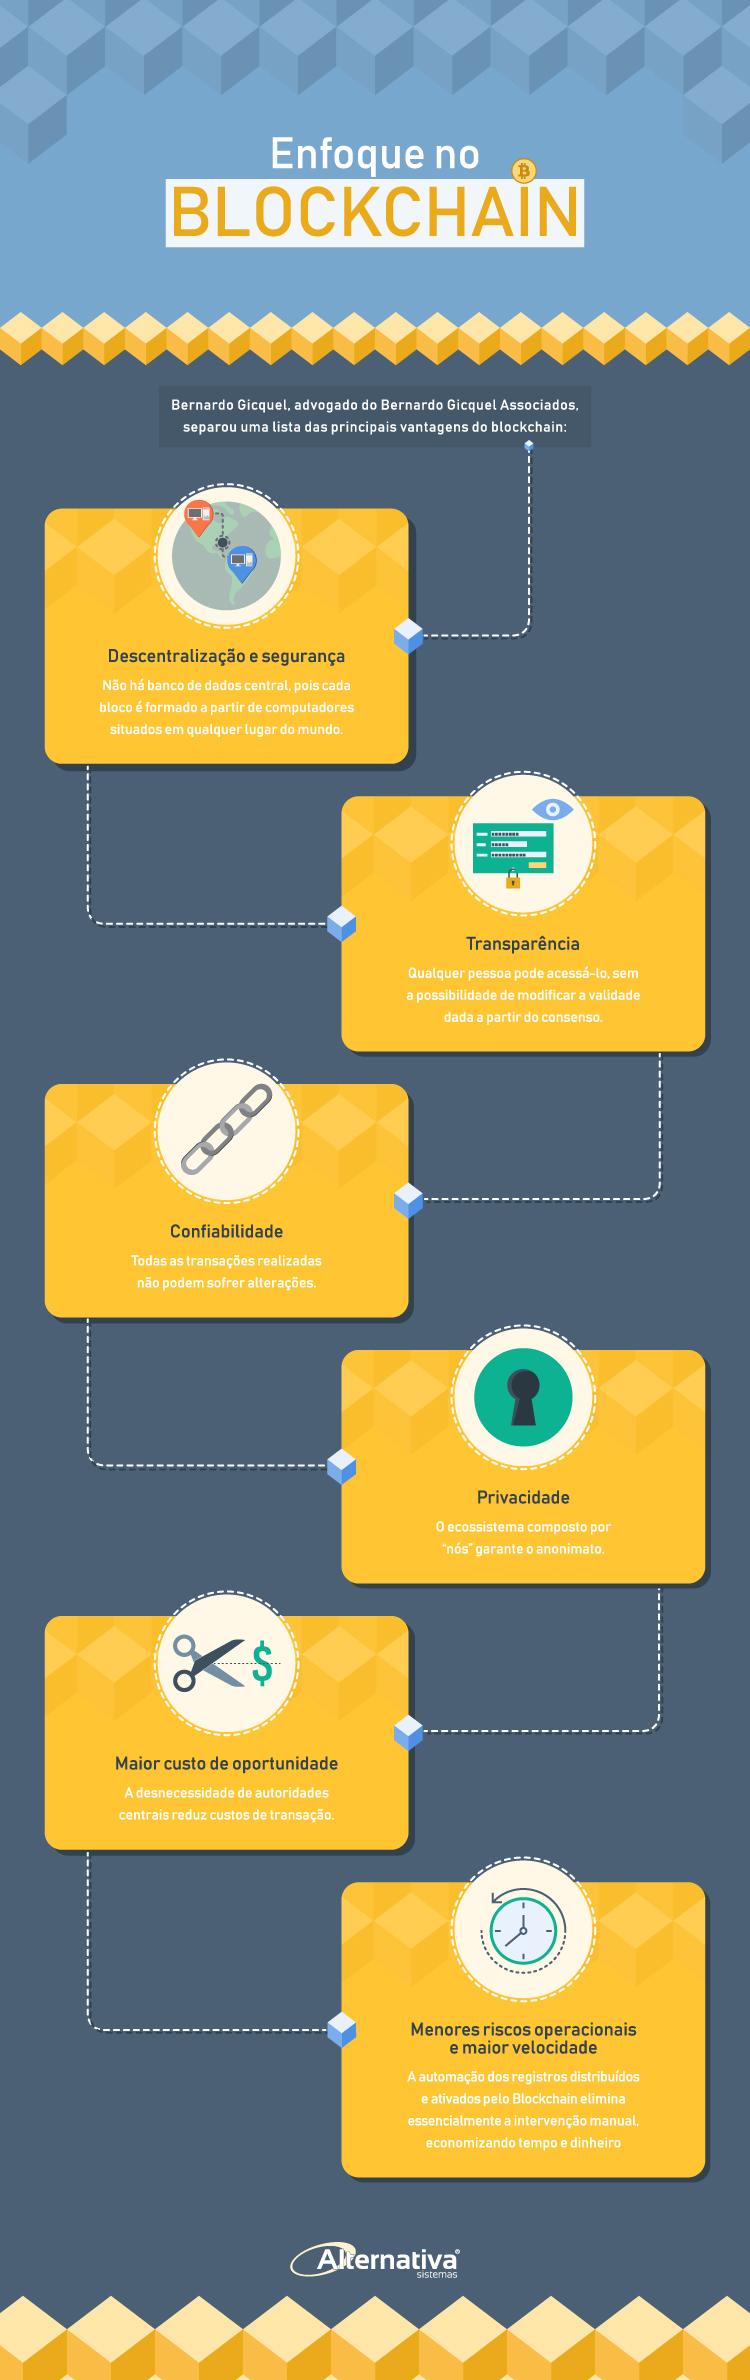 infografico-enfoque-no-blockchain---Alternativa-Sistemas